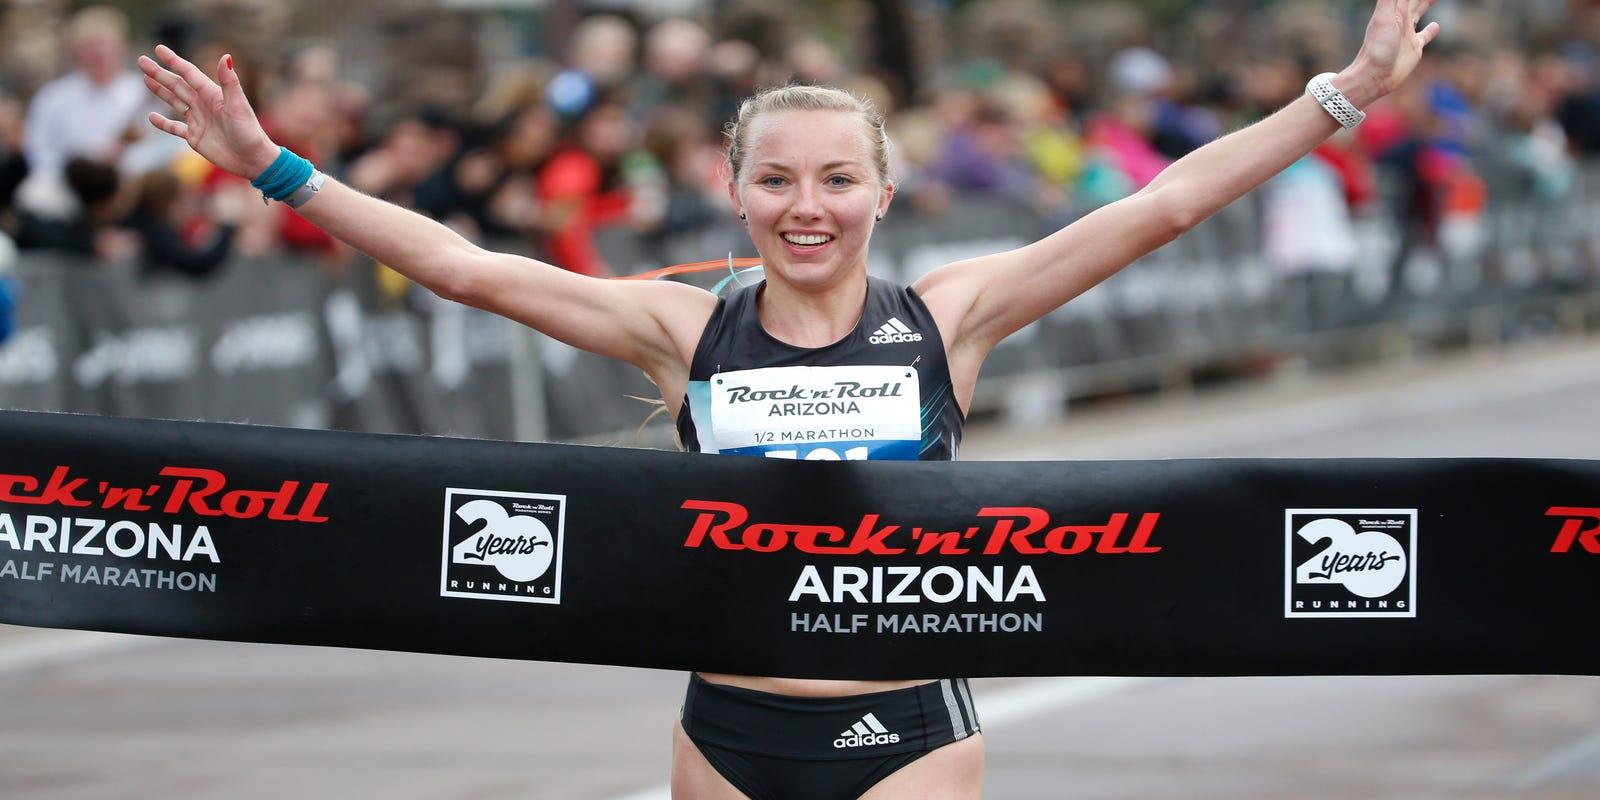 97b6cc5e2e5a Results  Rock  n  Roll Arizona 1 2 Marathon women s event